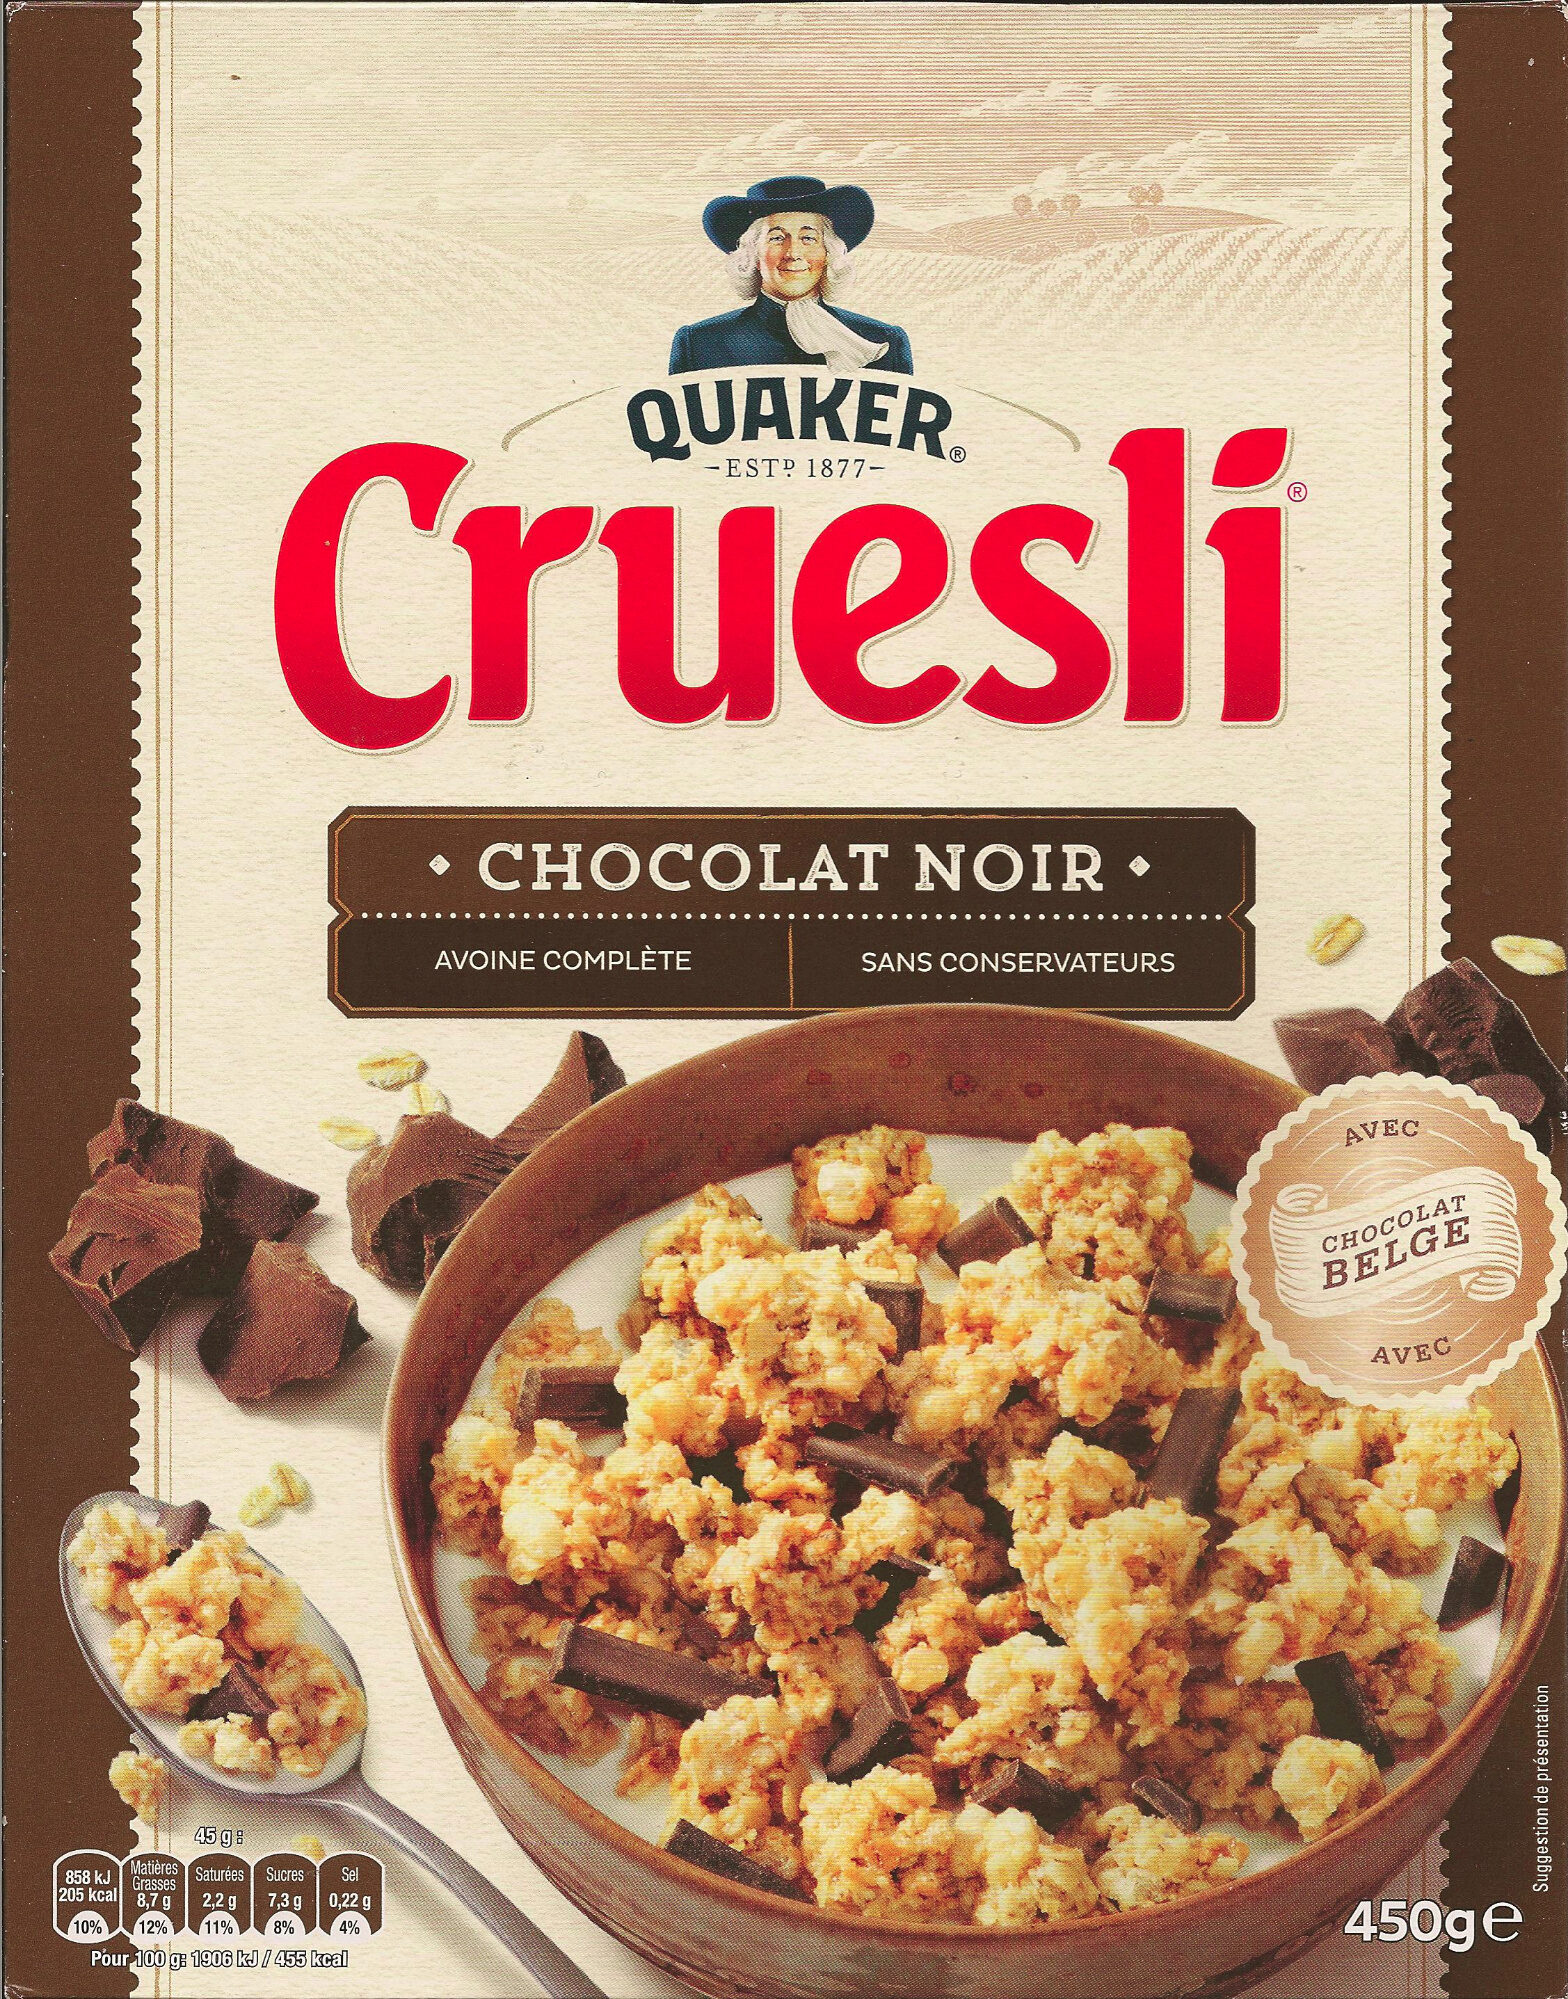 Cruesli chocolat noir - Produit - fr